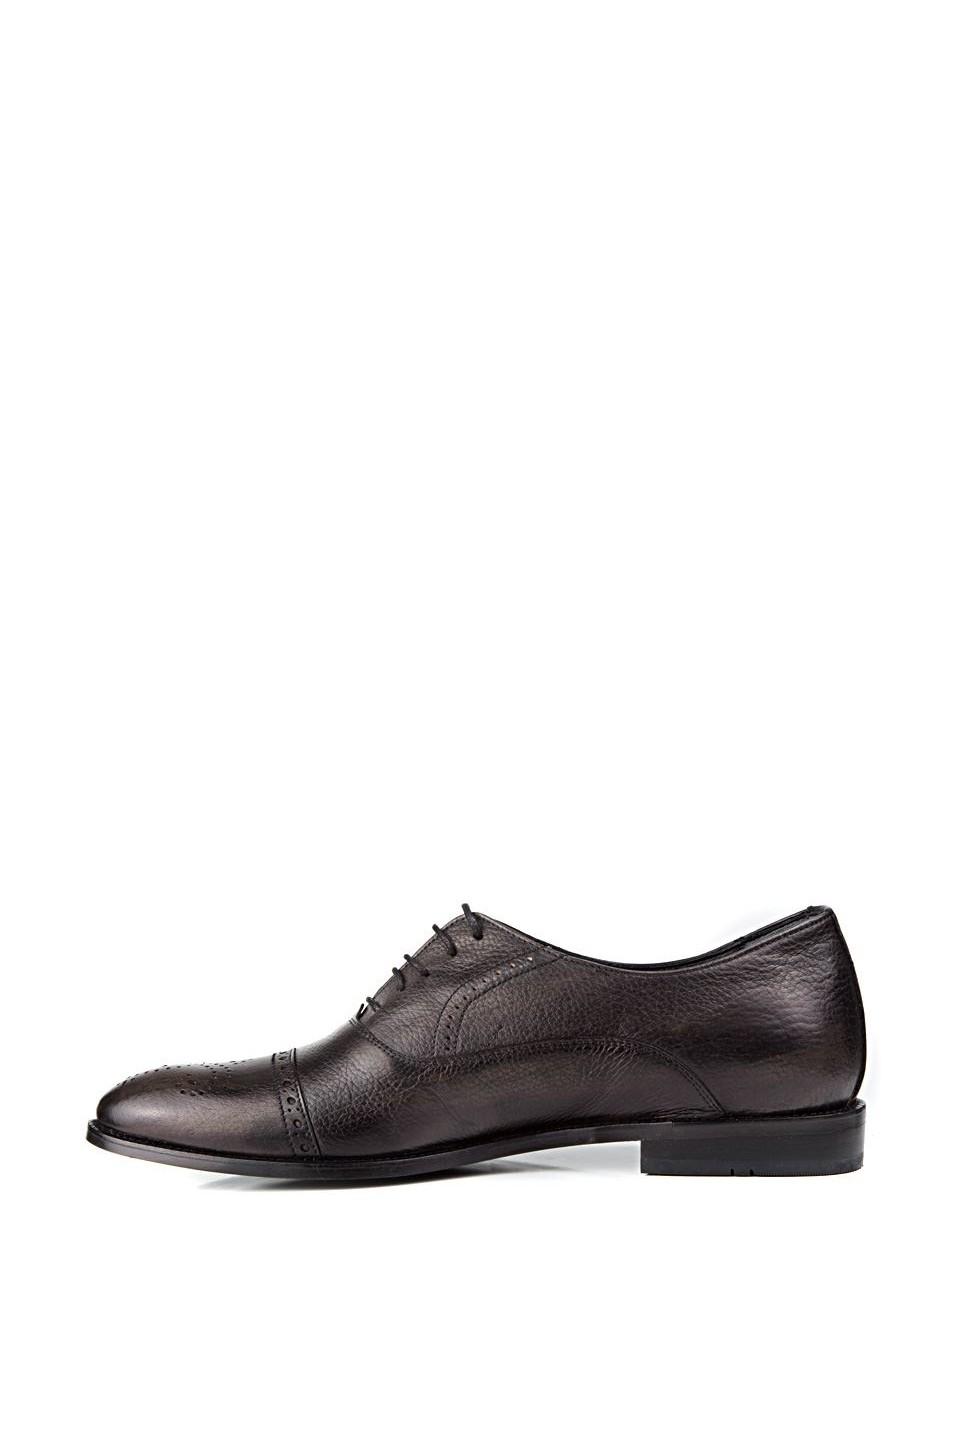 4aa864064 صورة 1 من اصل 4. حذاء رجالي جلد رسمي - باسعار الجملة - دي اس دامات - DS  damat